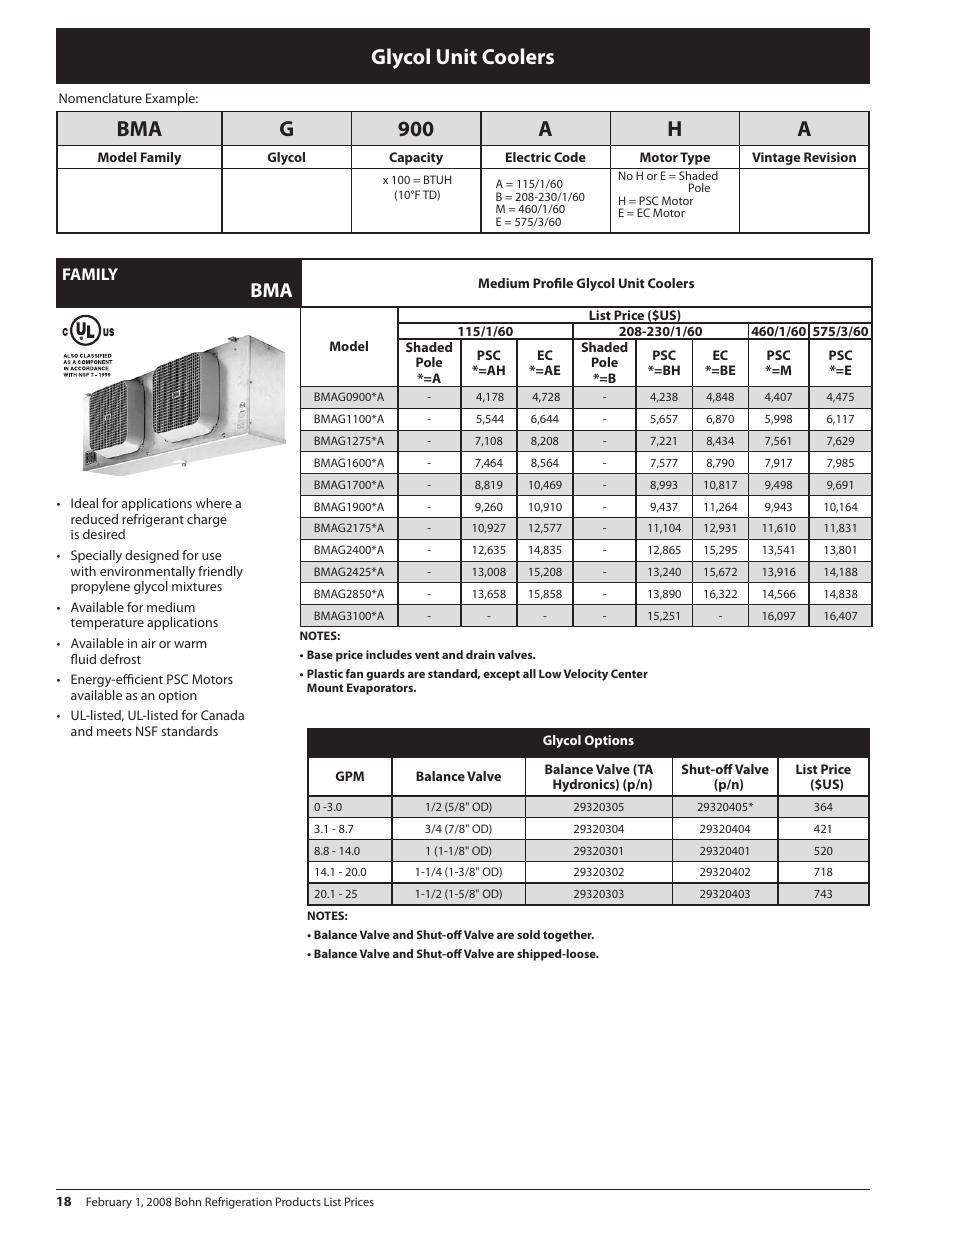 Erfreut Bohn Heatcraft Schaltplan Ideen - Elektrische Schaltplan ...